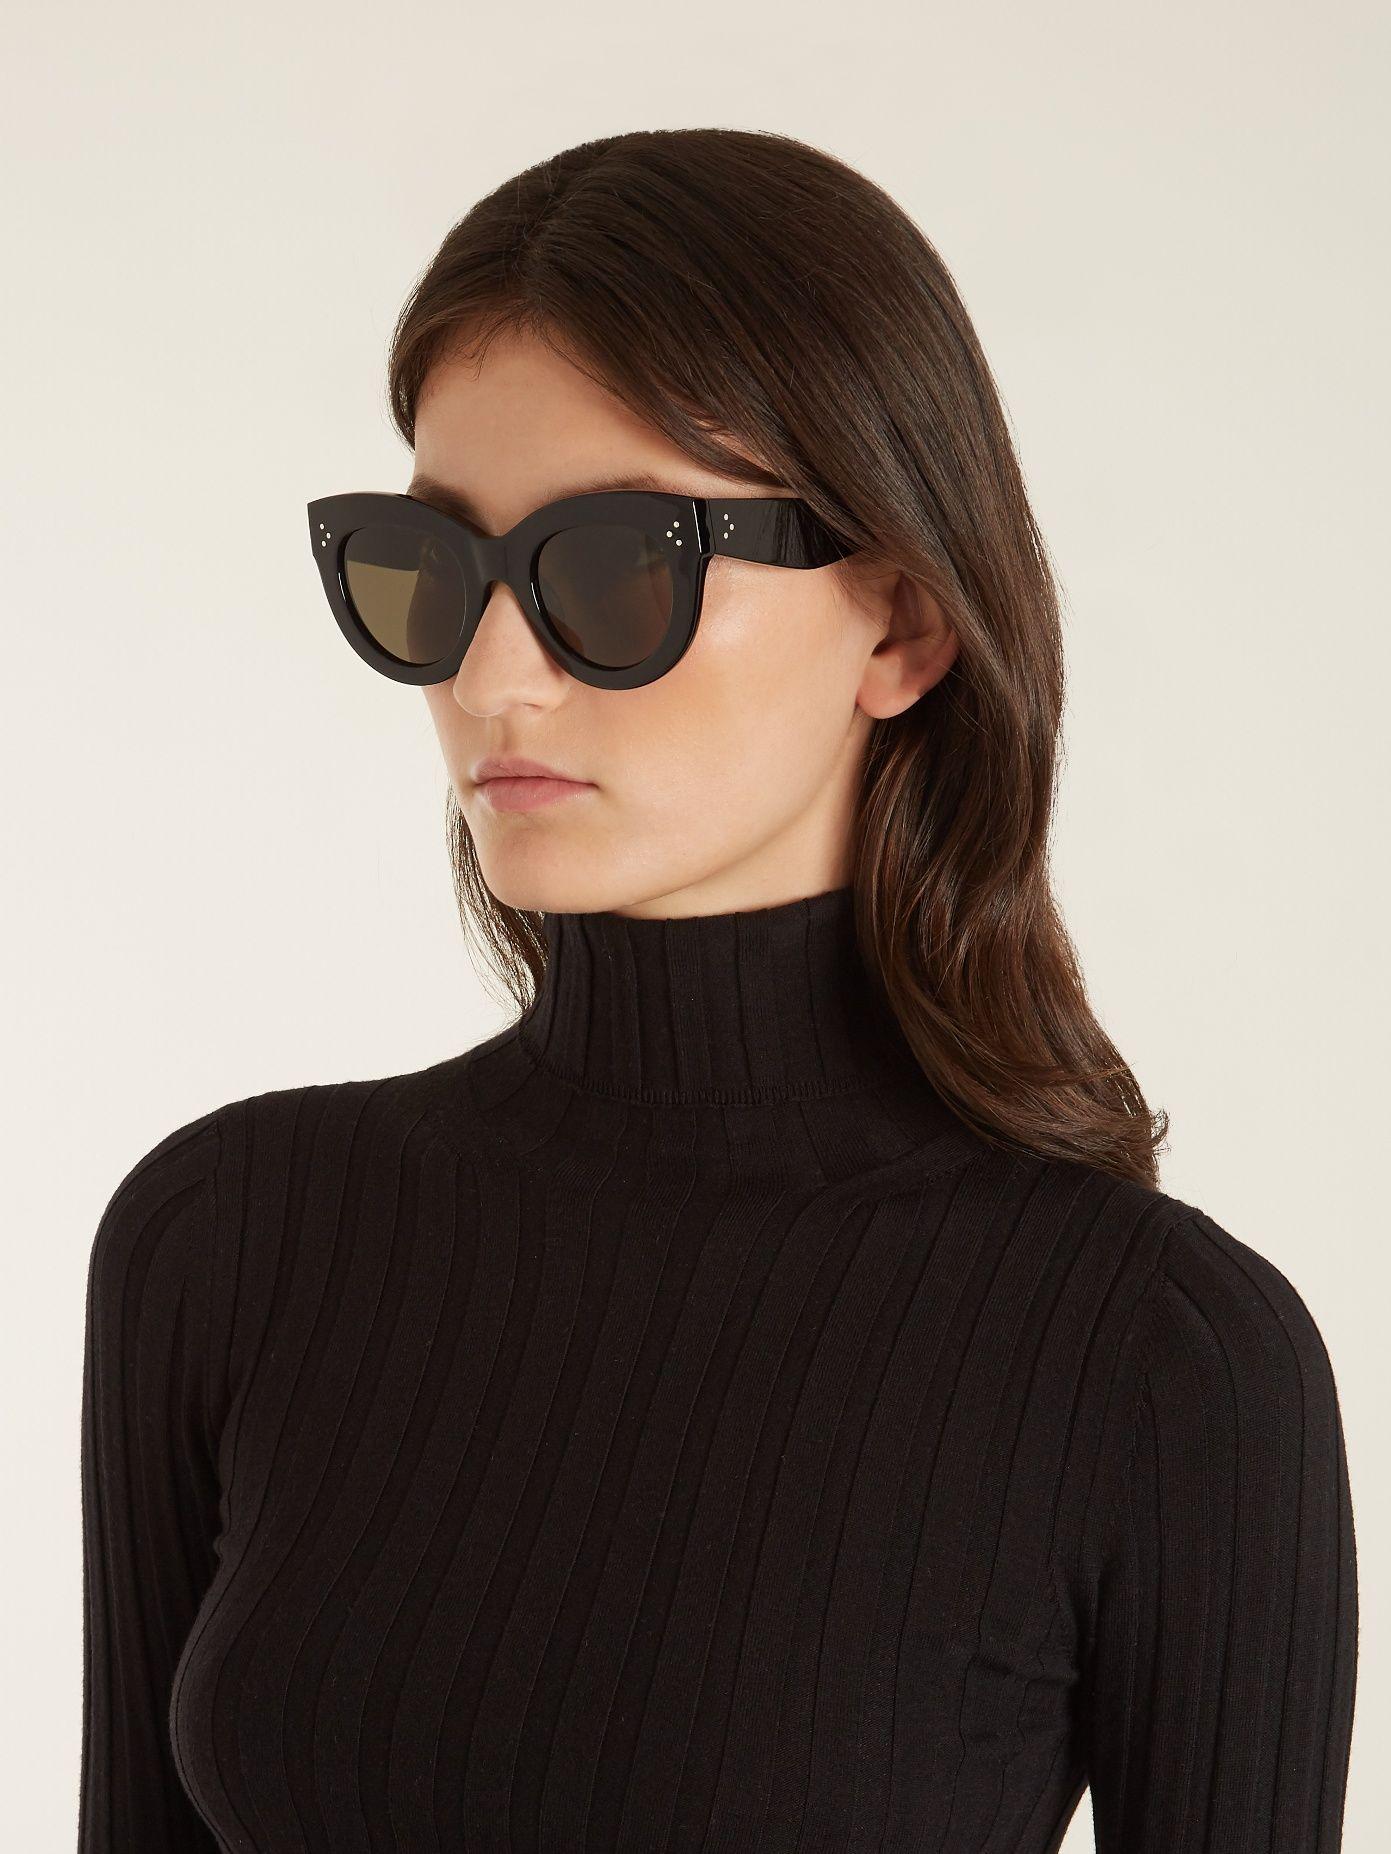 57dbc52165d0 Céline Eyewear Caty cat-eye acetate sunglasses